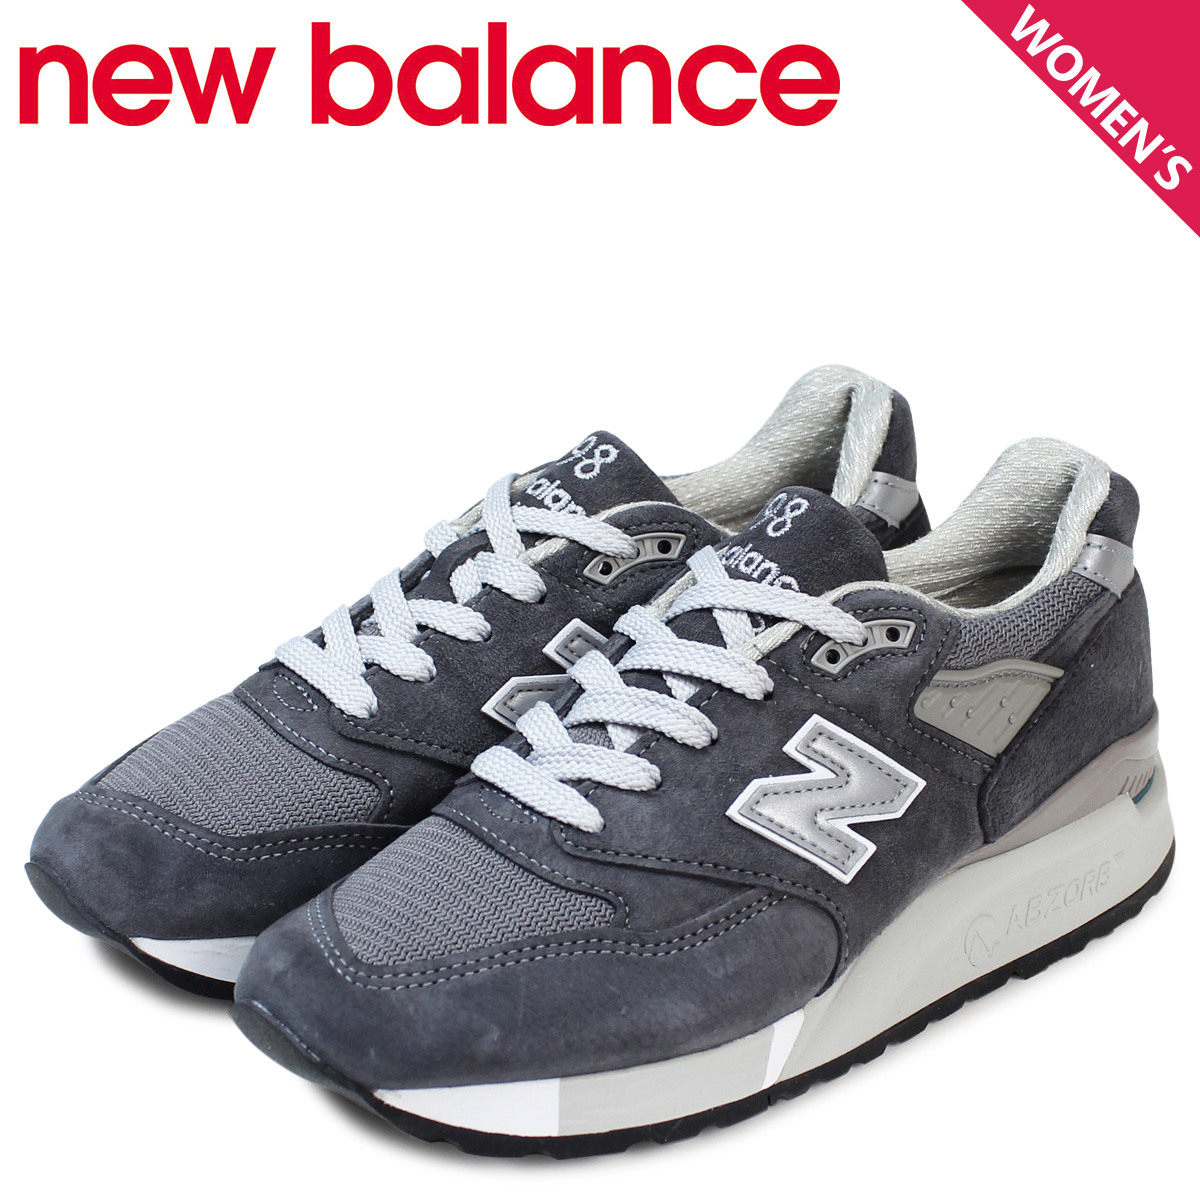 New Balance 998 Flate Føtter GkqZq